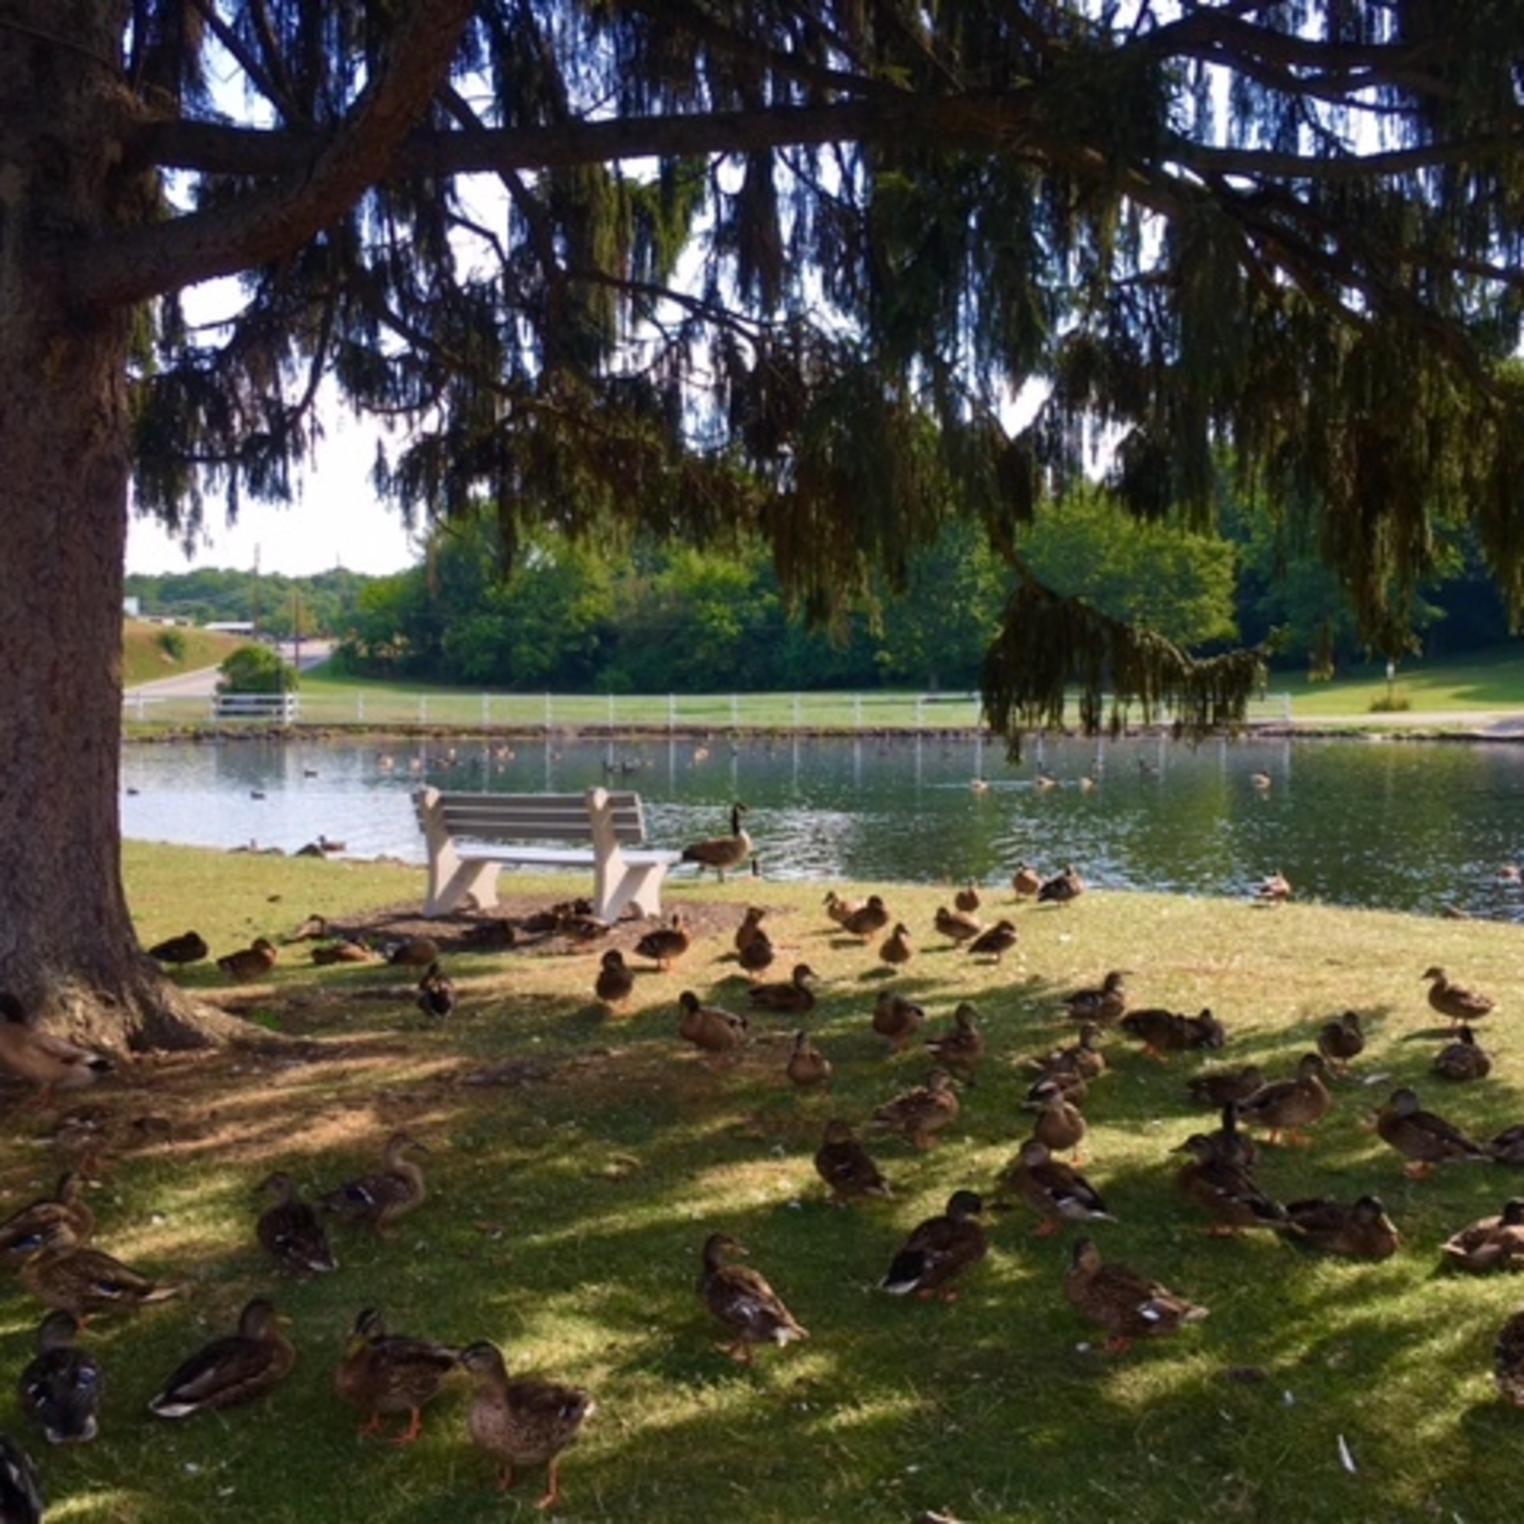 Dykeman Park